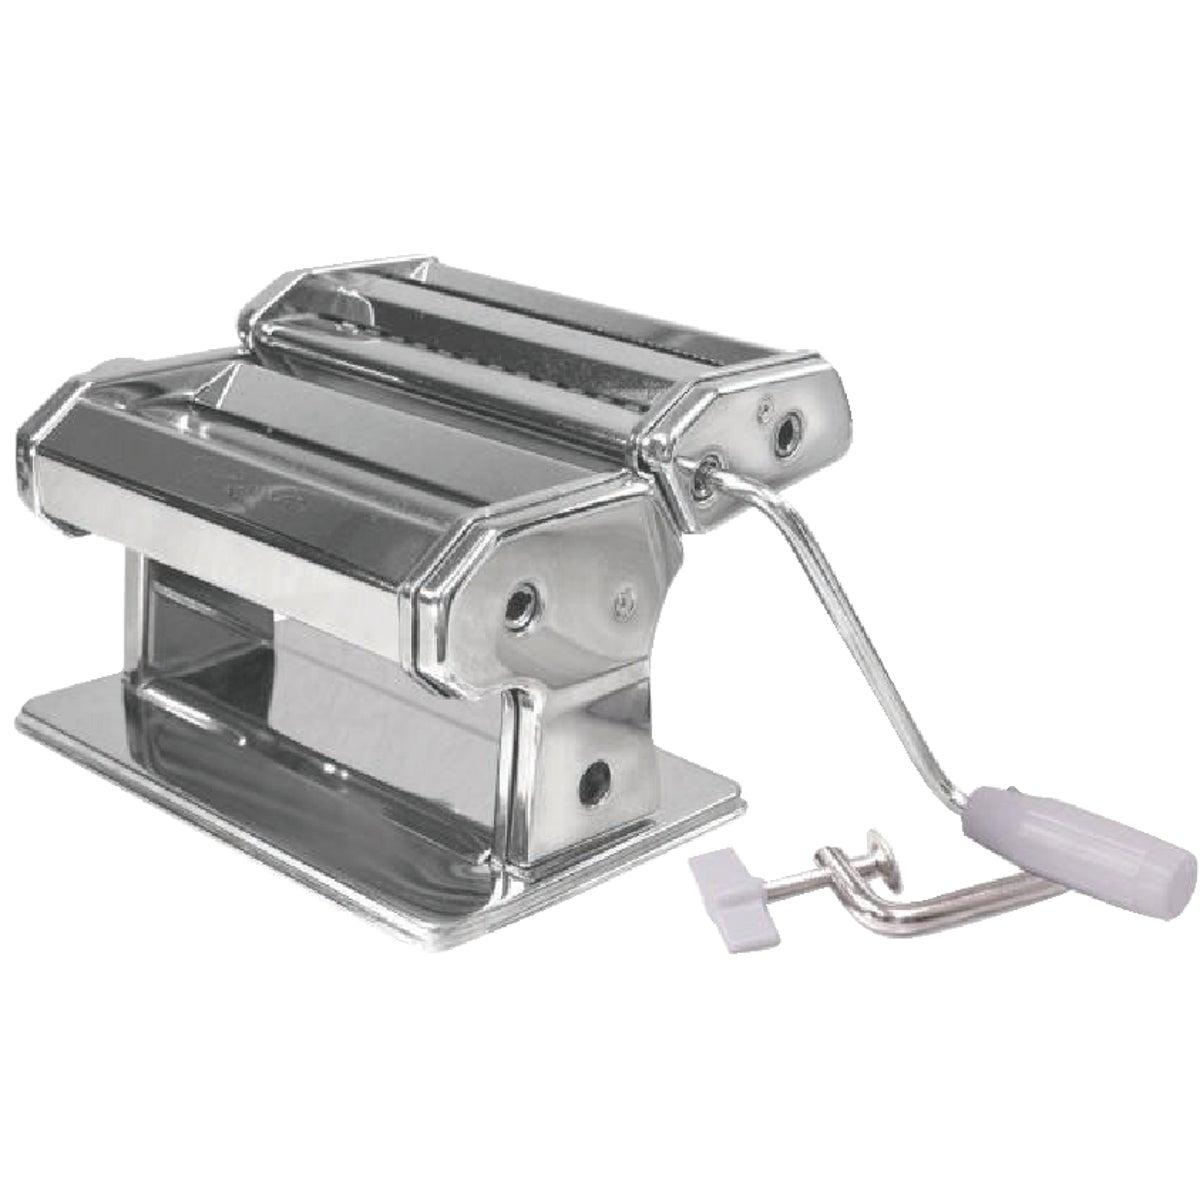 Weston Products MANUAL PASTA MACHINE 01-0201